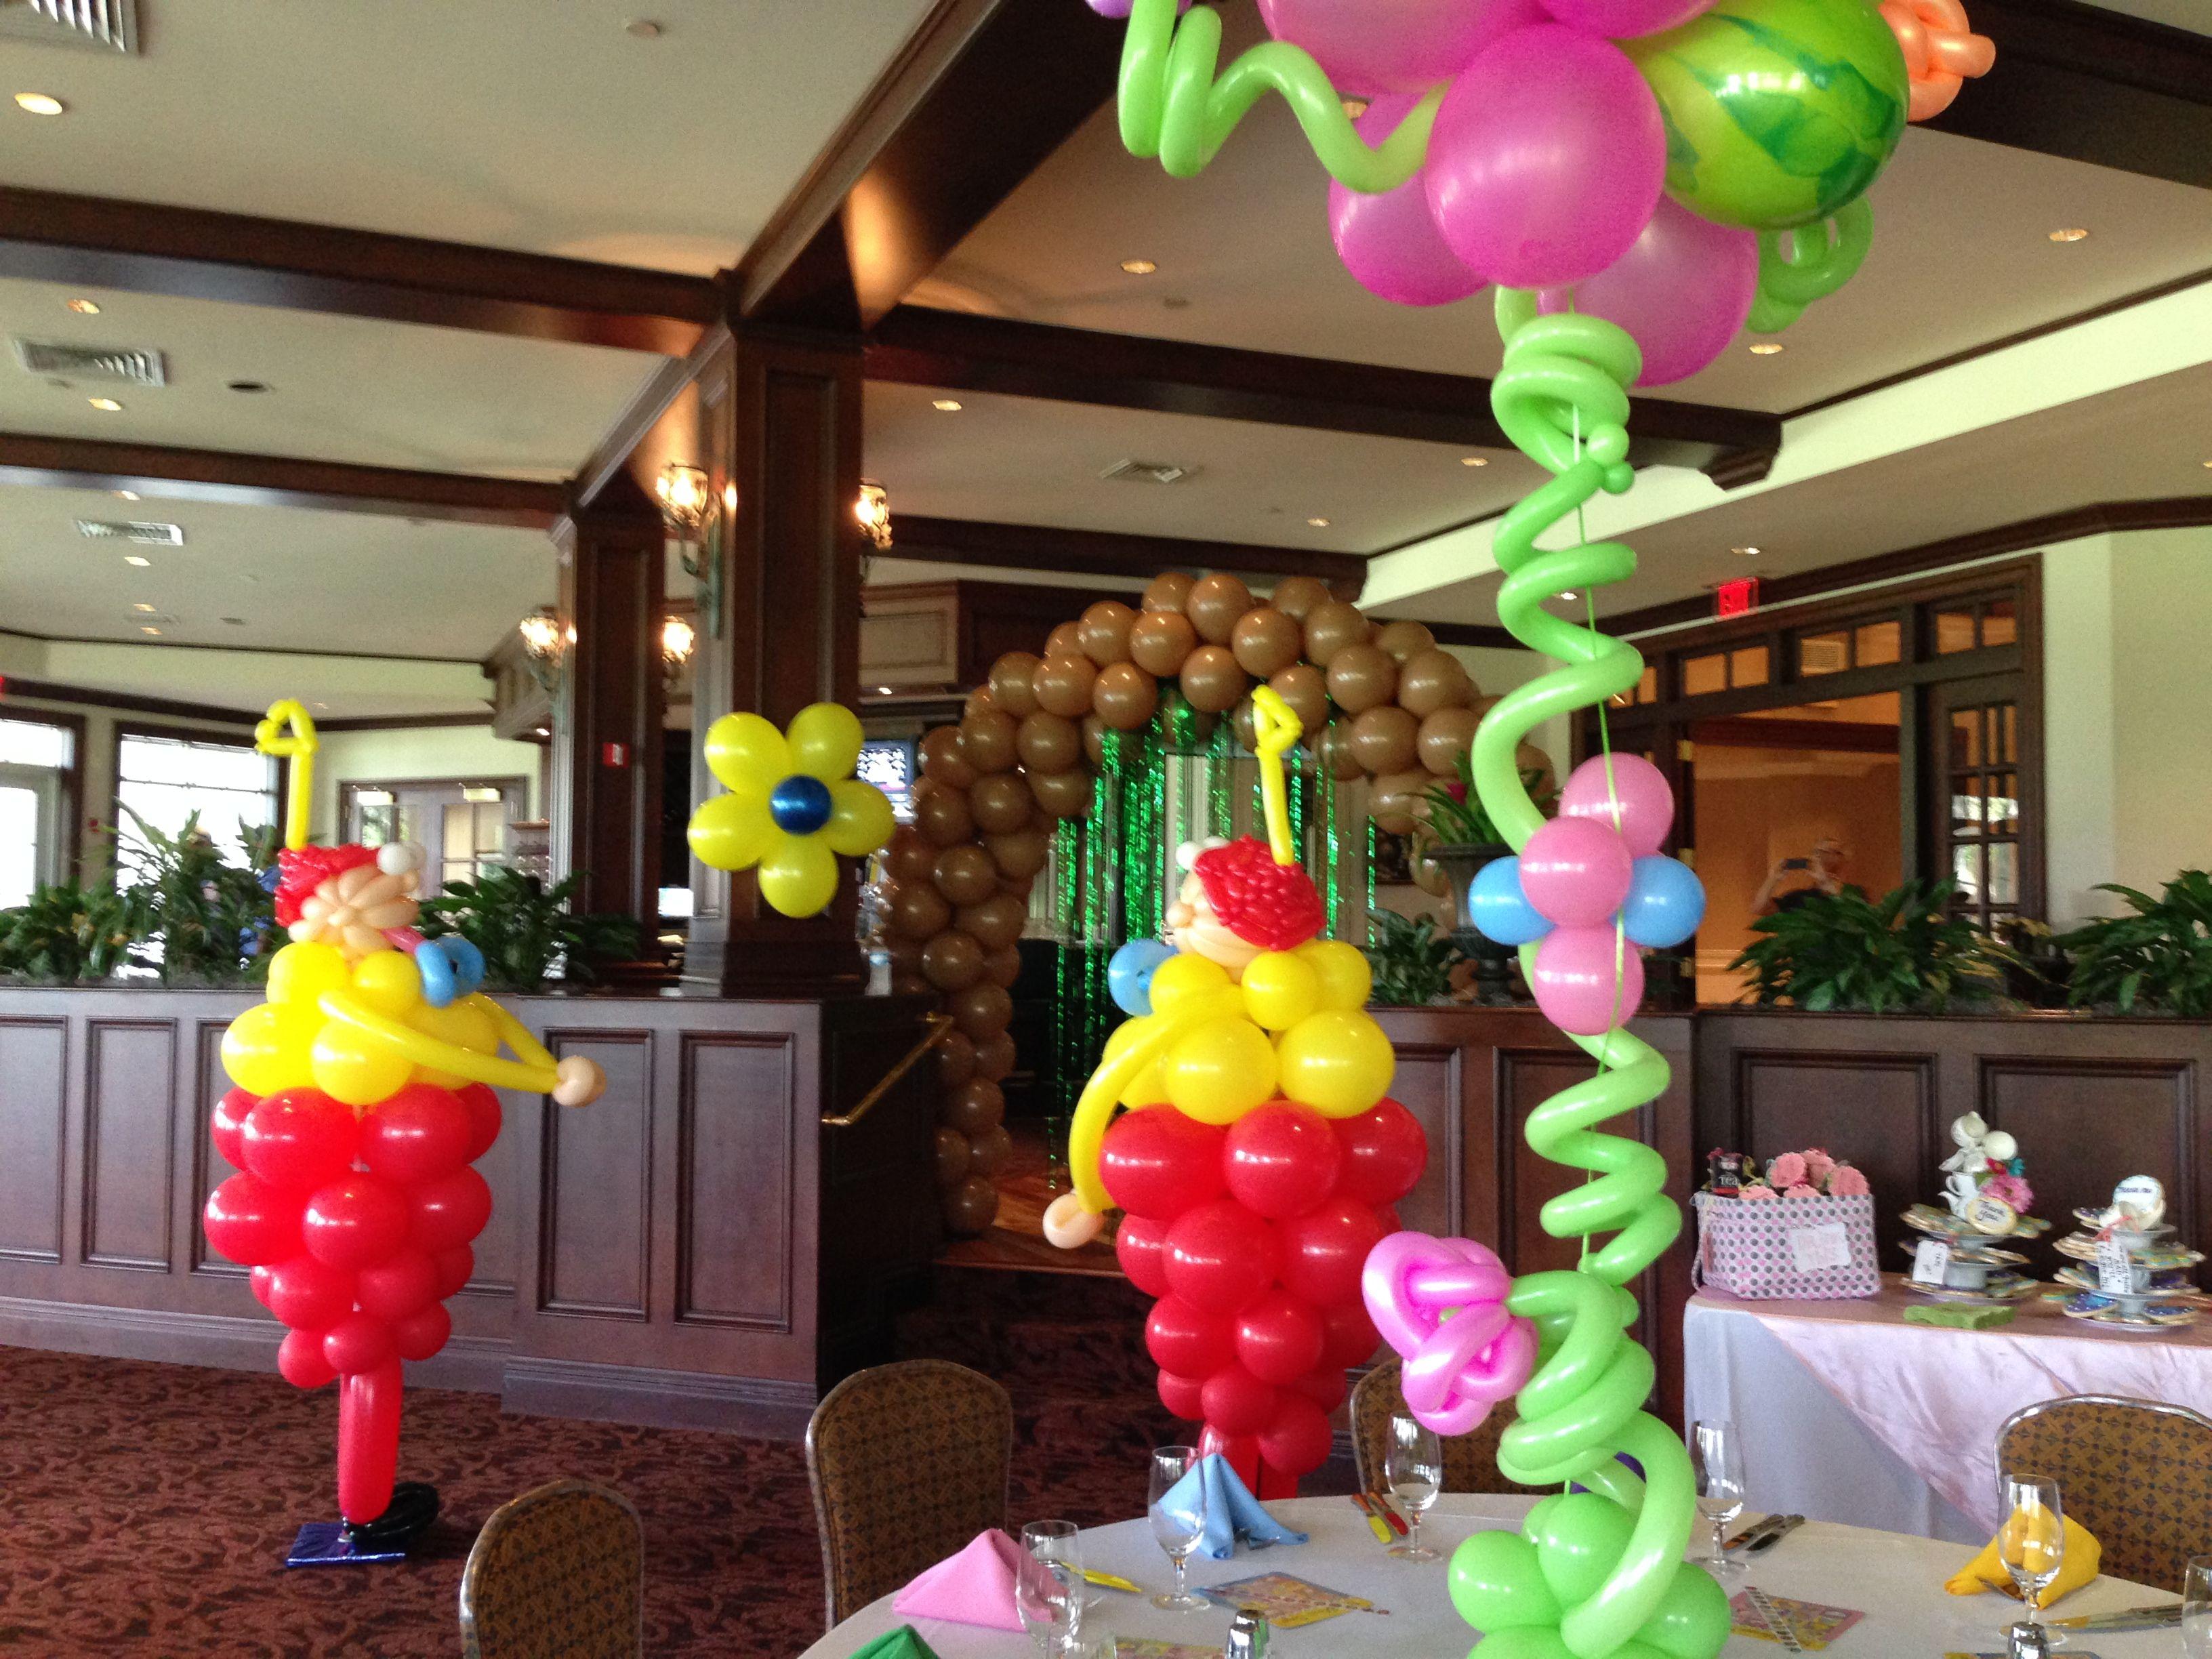 Alice in Wonderland theme party. TweedleDee and Tweedle Dum balloon aculpture. http://www.dreamarkevents.com/wonderland.html